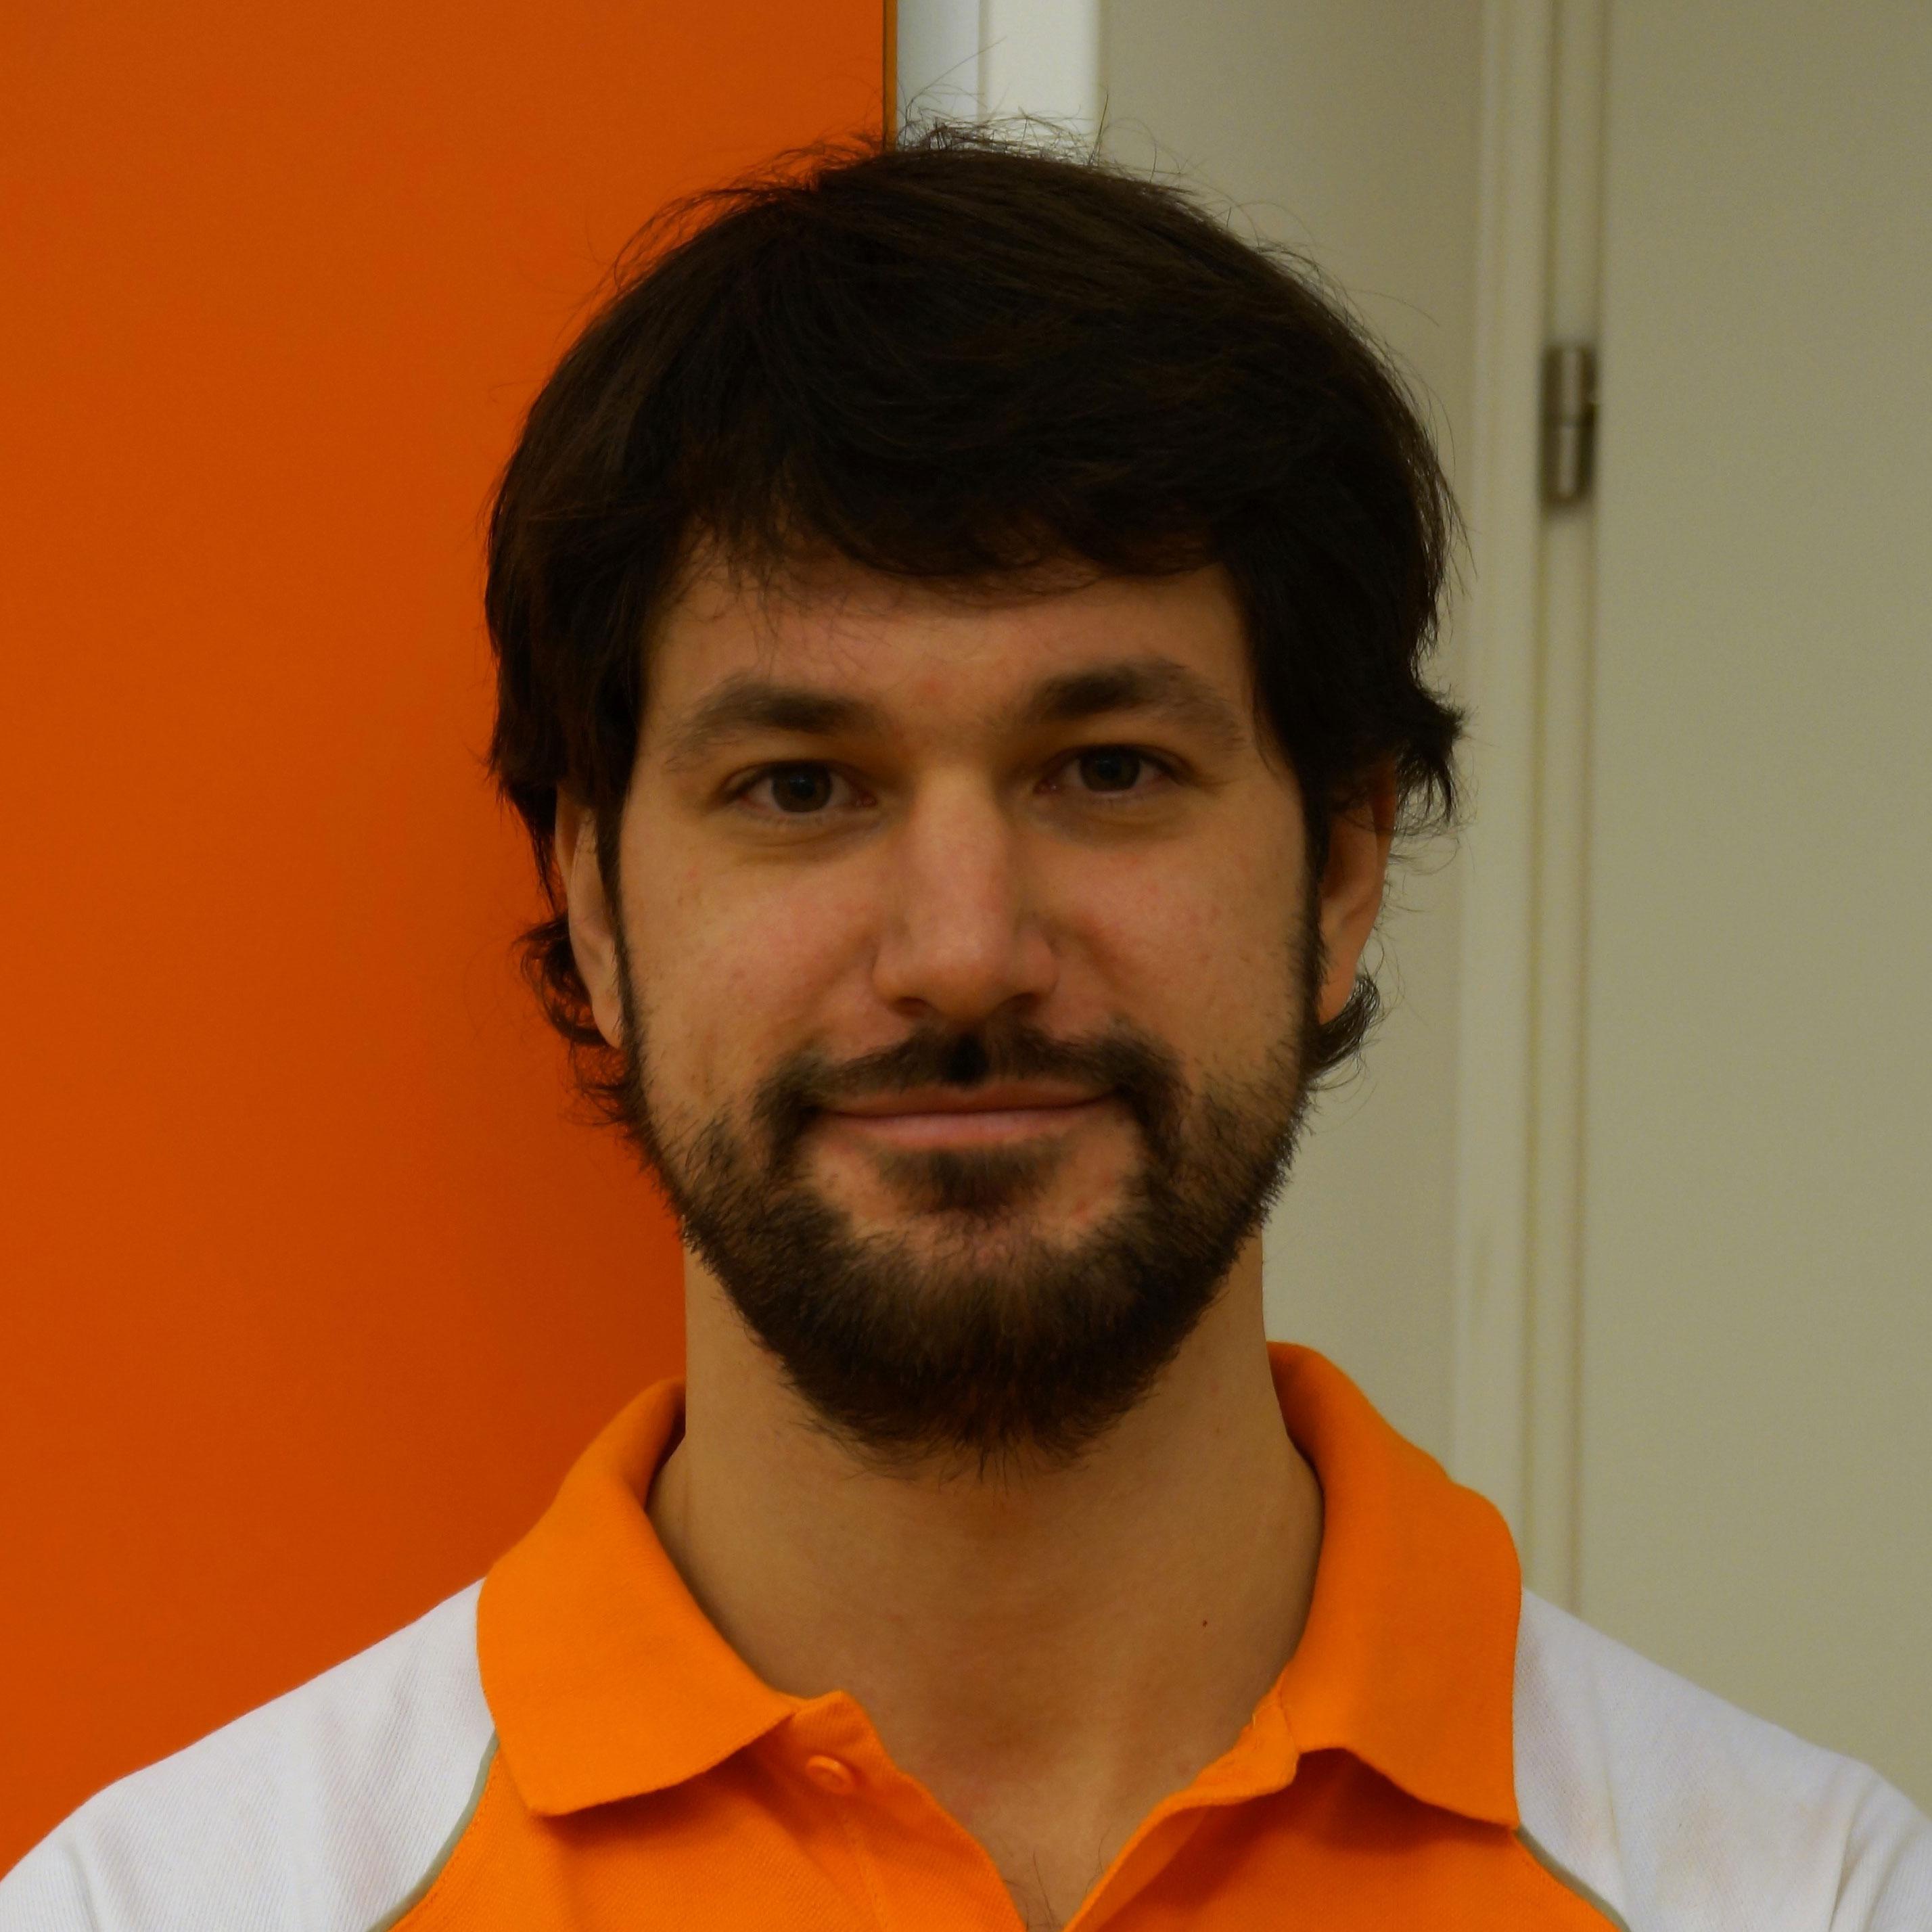 Dott. Francesco Toscano